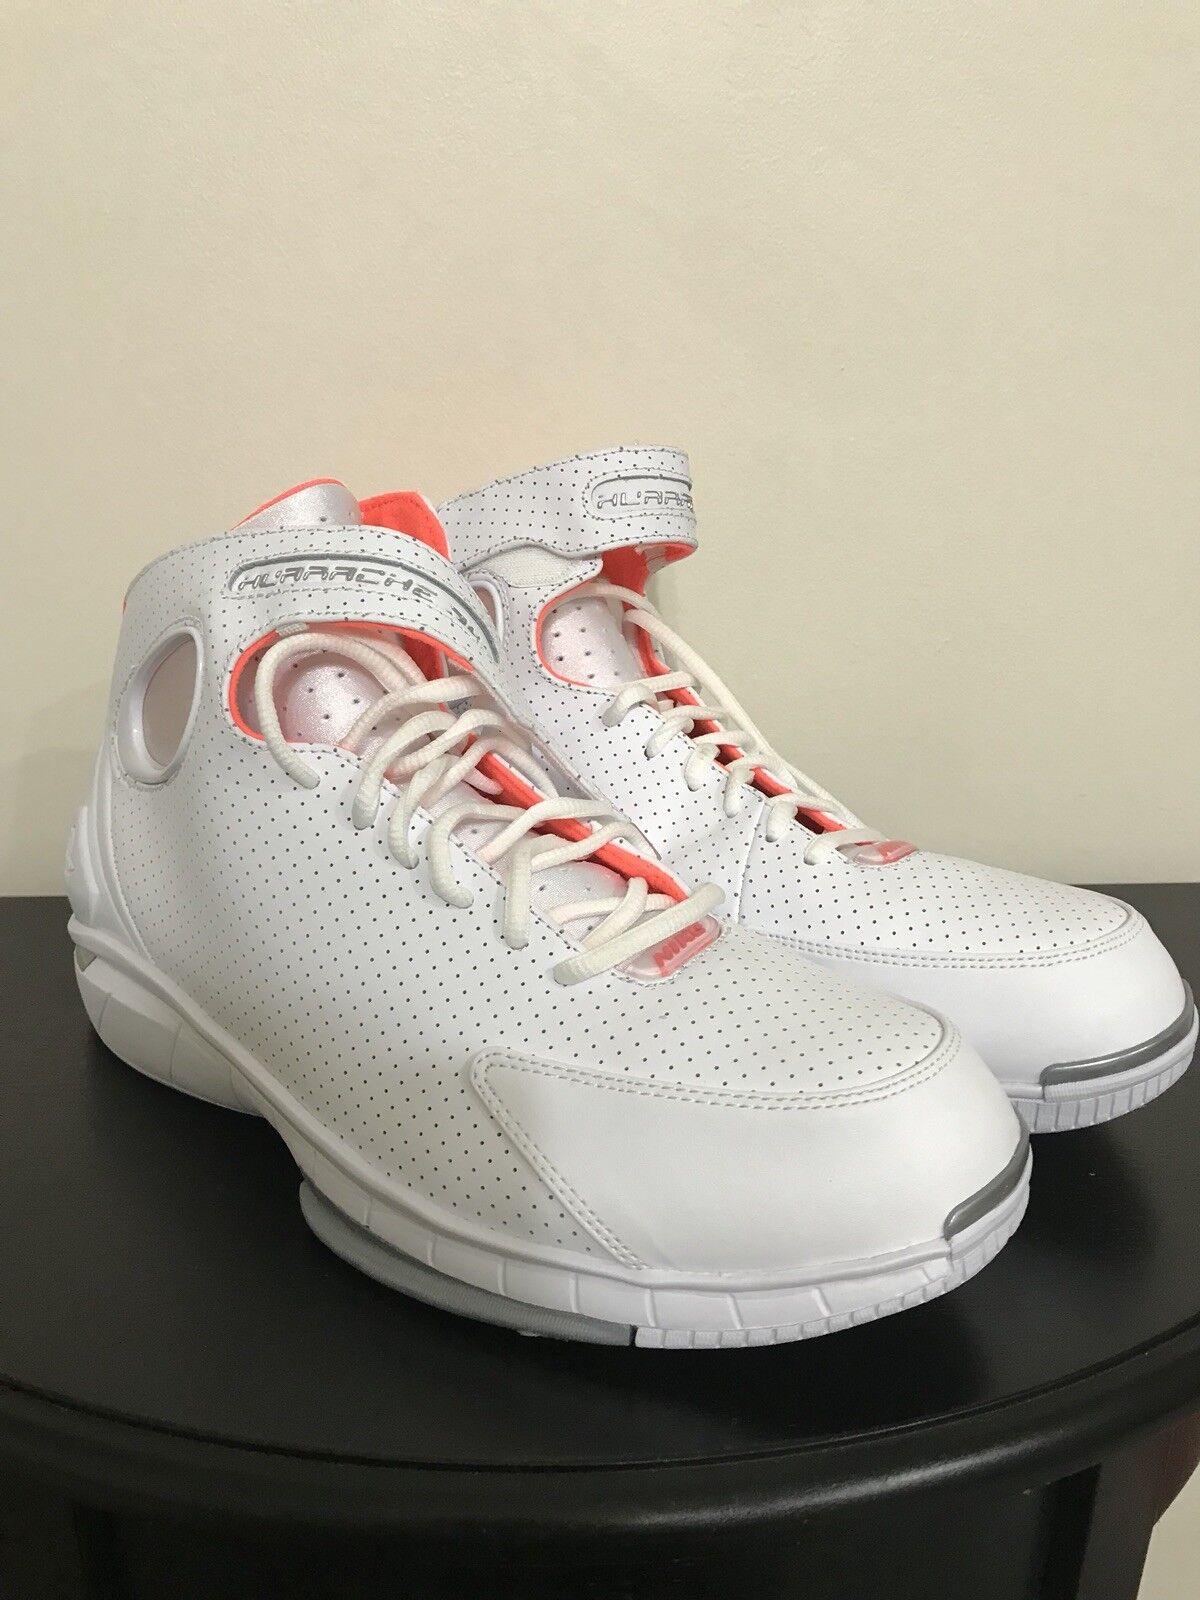 NEW Nike Air Zoom Huarache 2K4 Mens Basketball shoes 308475-102 Size 11.5 RARE